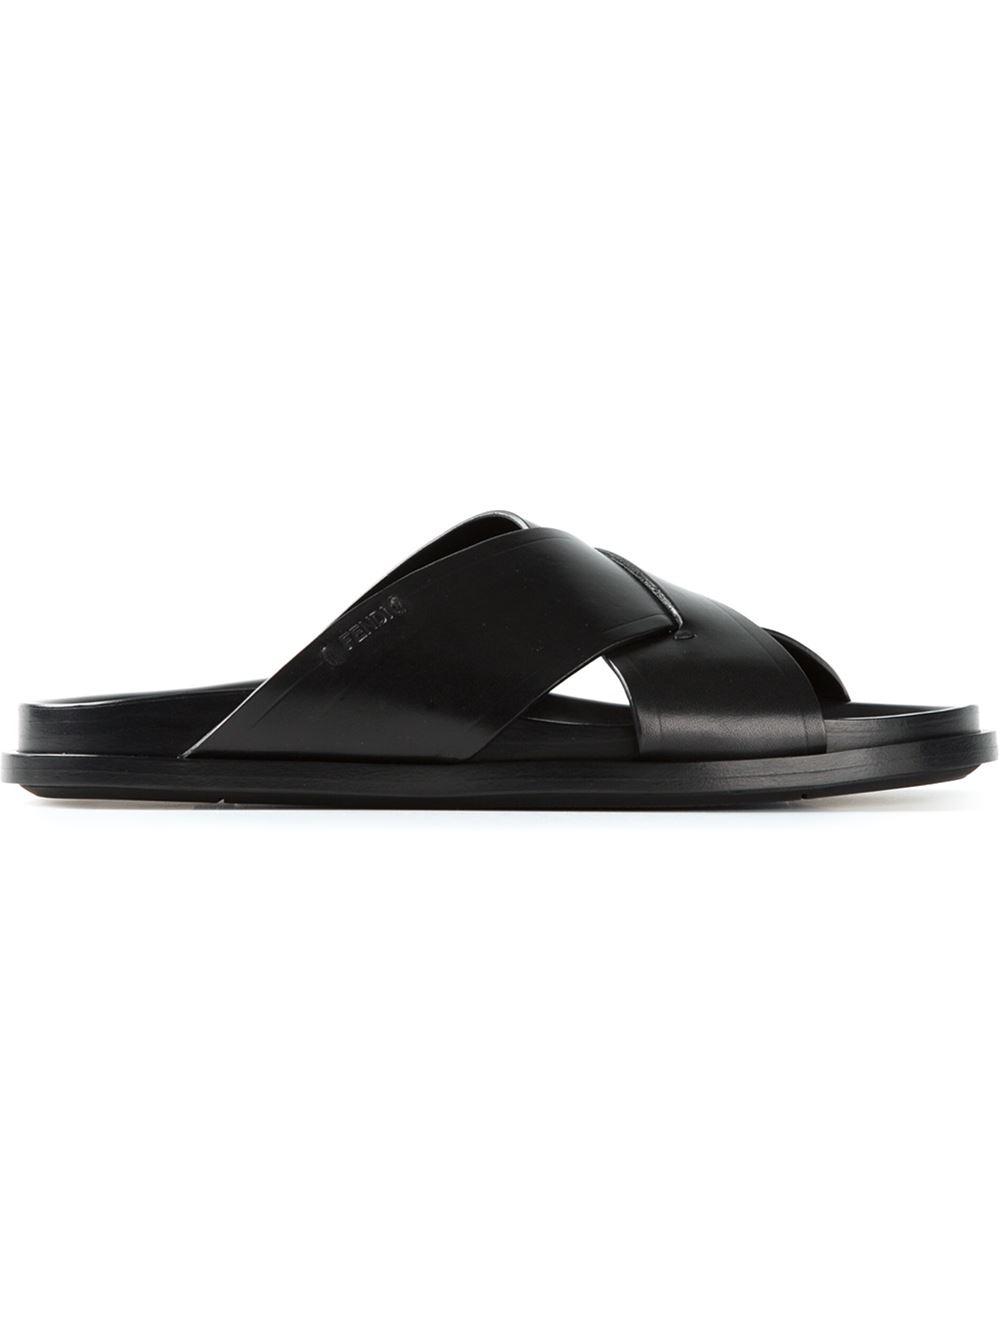 Fendi Shoes Mens